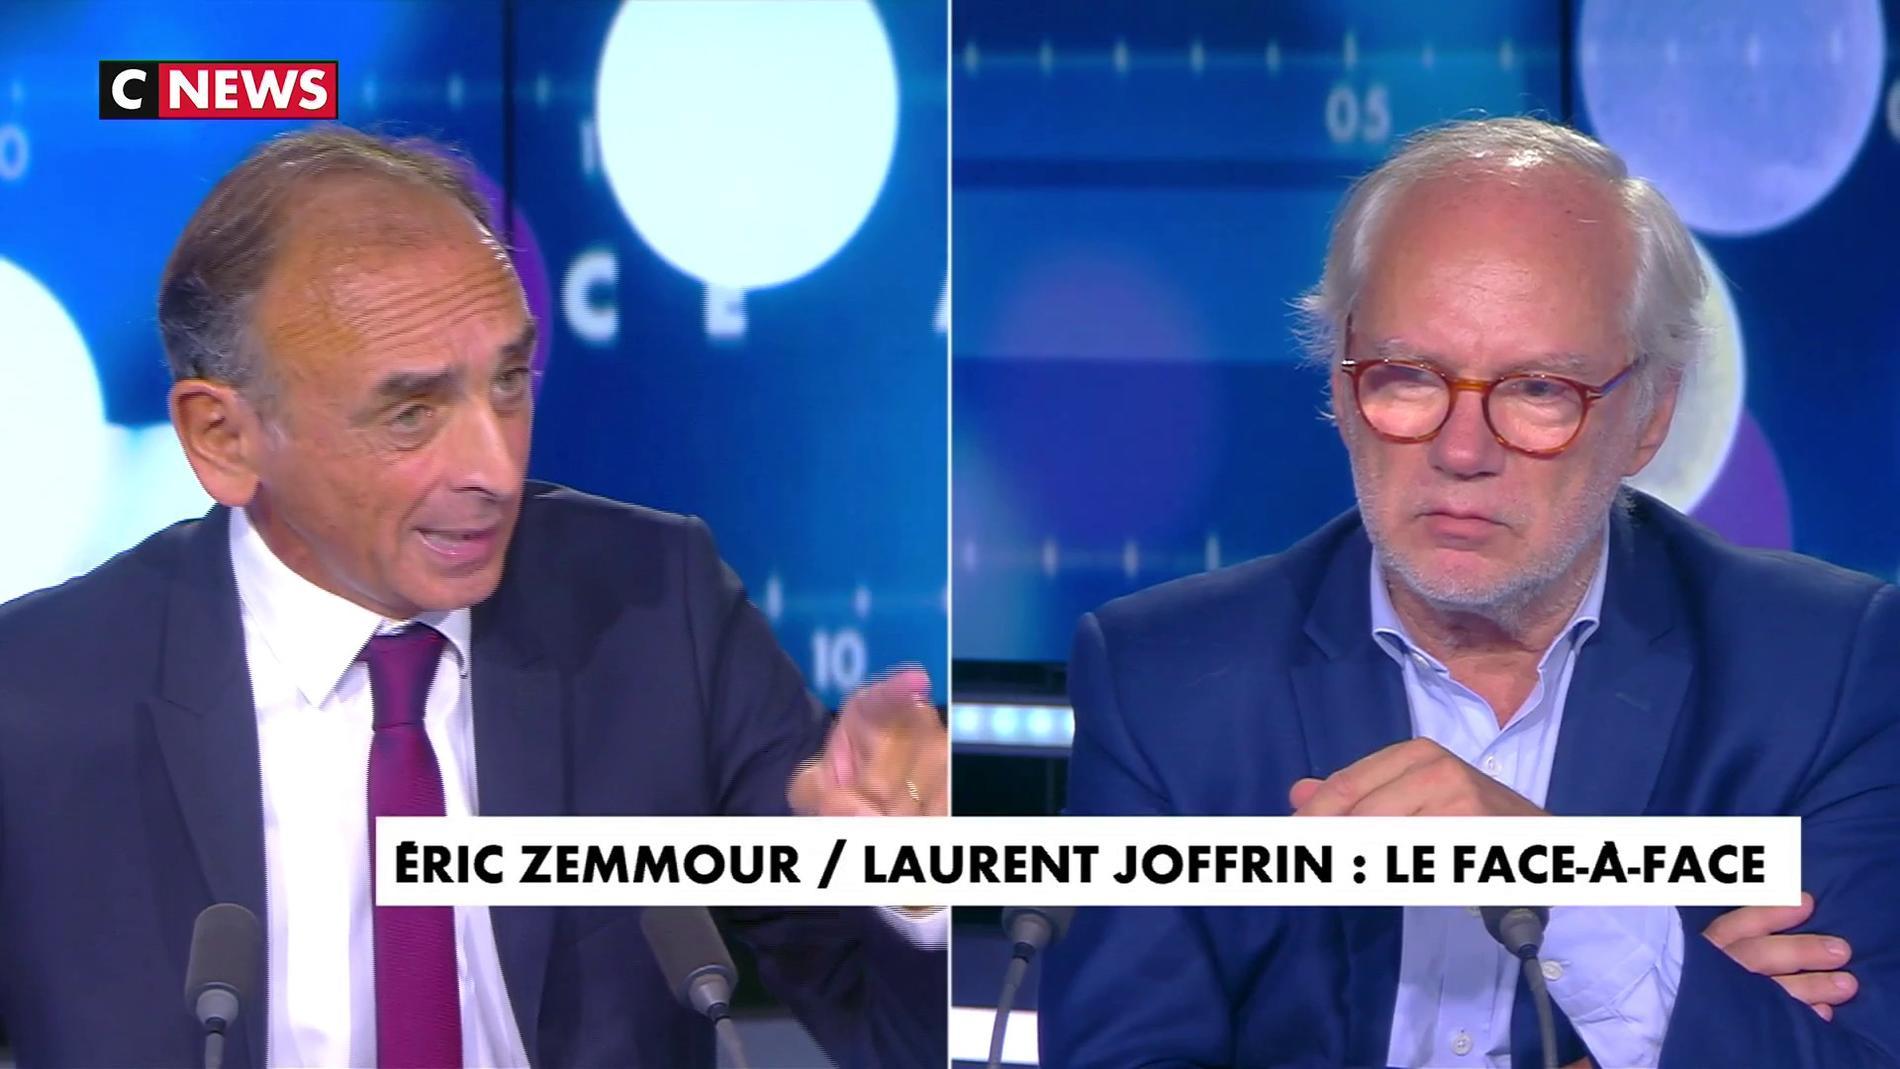 https://static.cnews.fr/sites/default/files/Reporters/zemmour_joffrin_5f5babdd51b0f.jpg